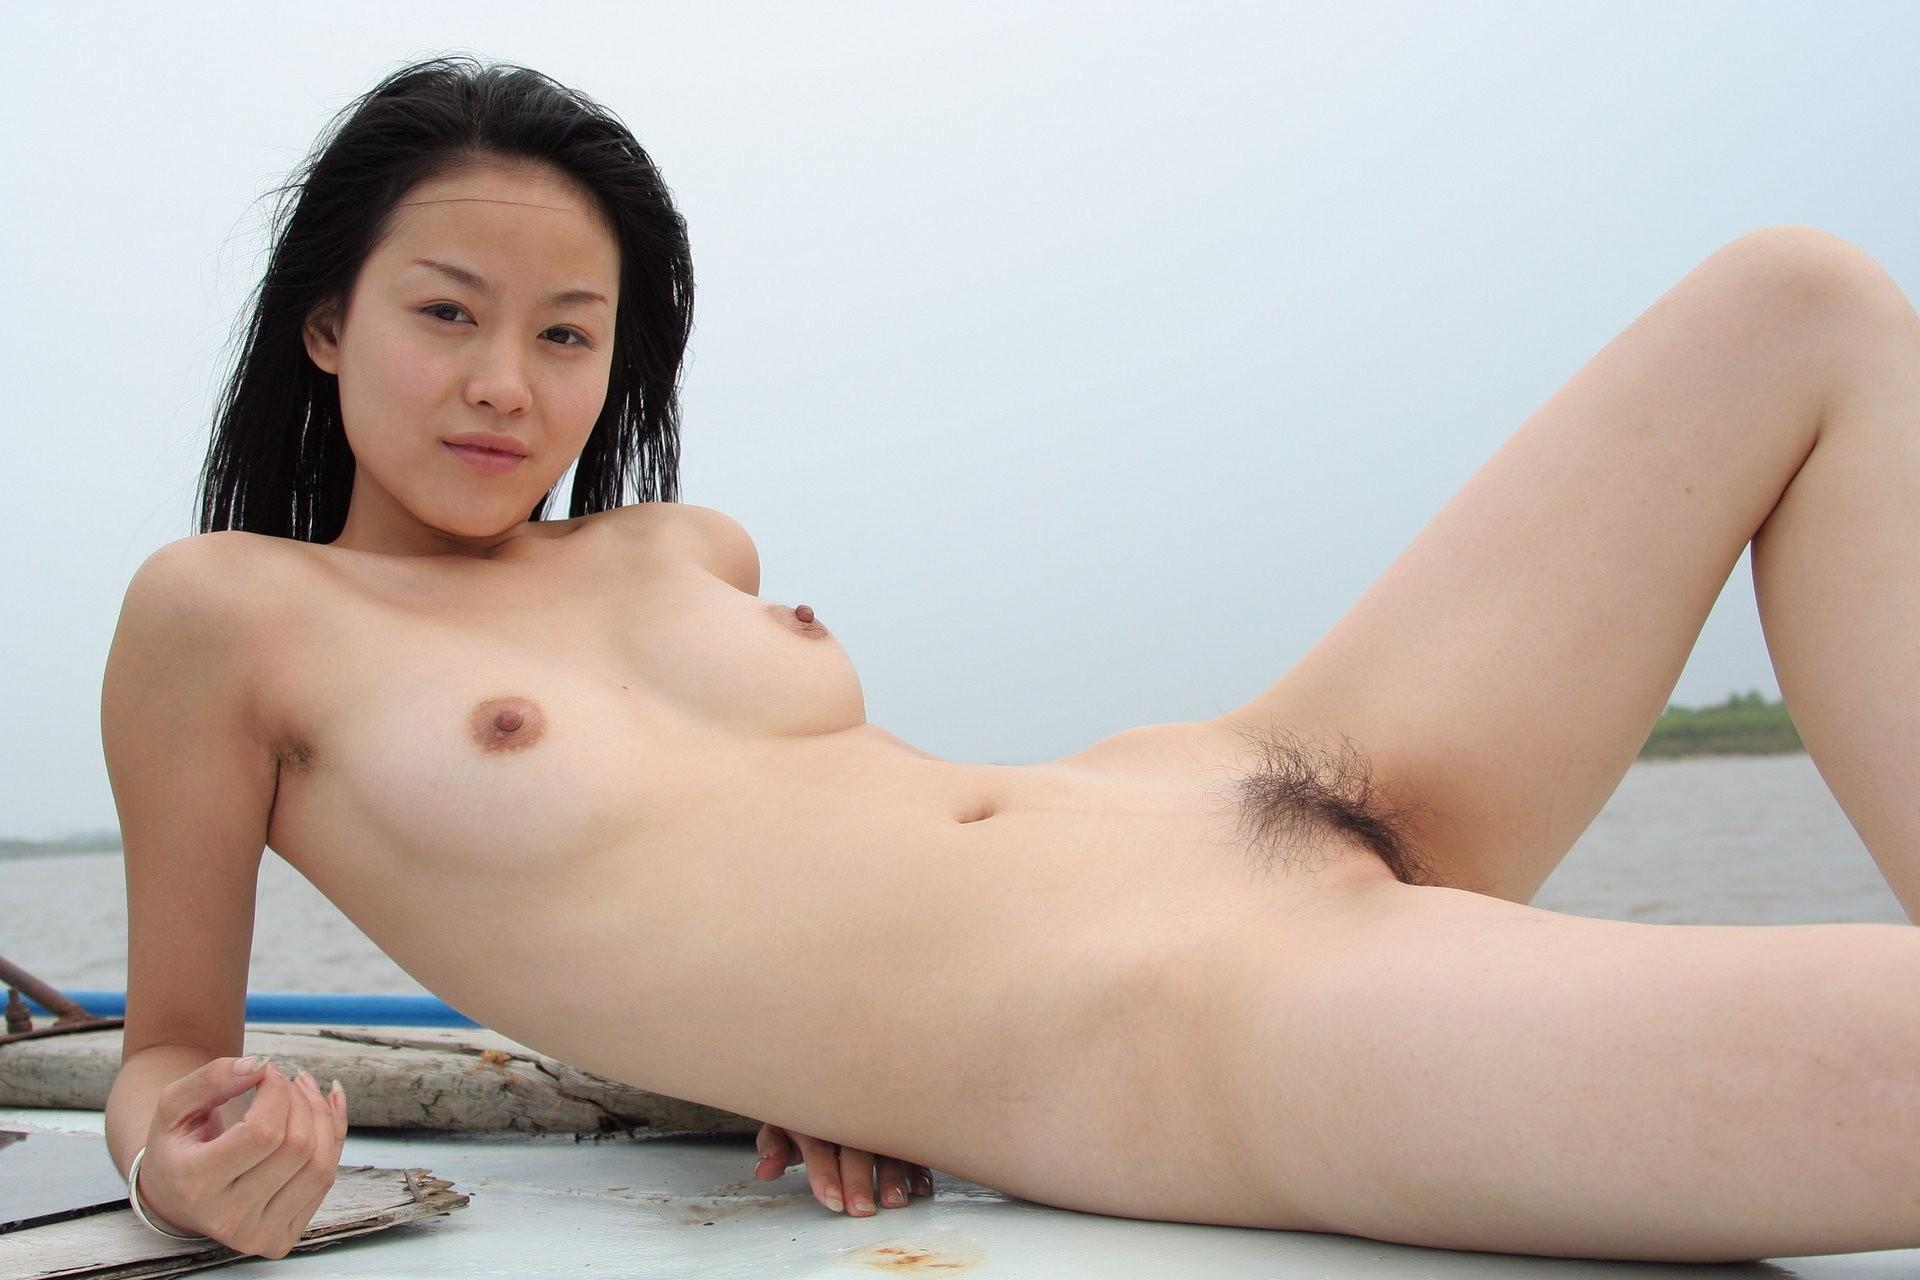 Hongkong pic girl nude, ass tonguing lesbians